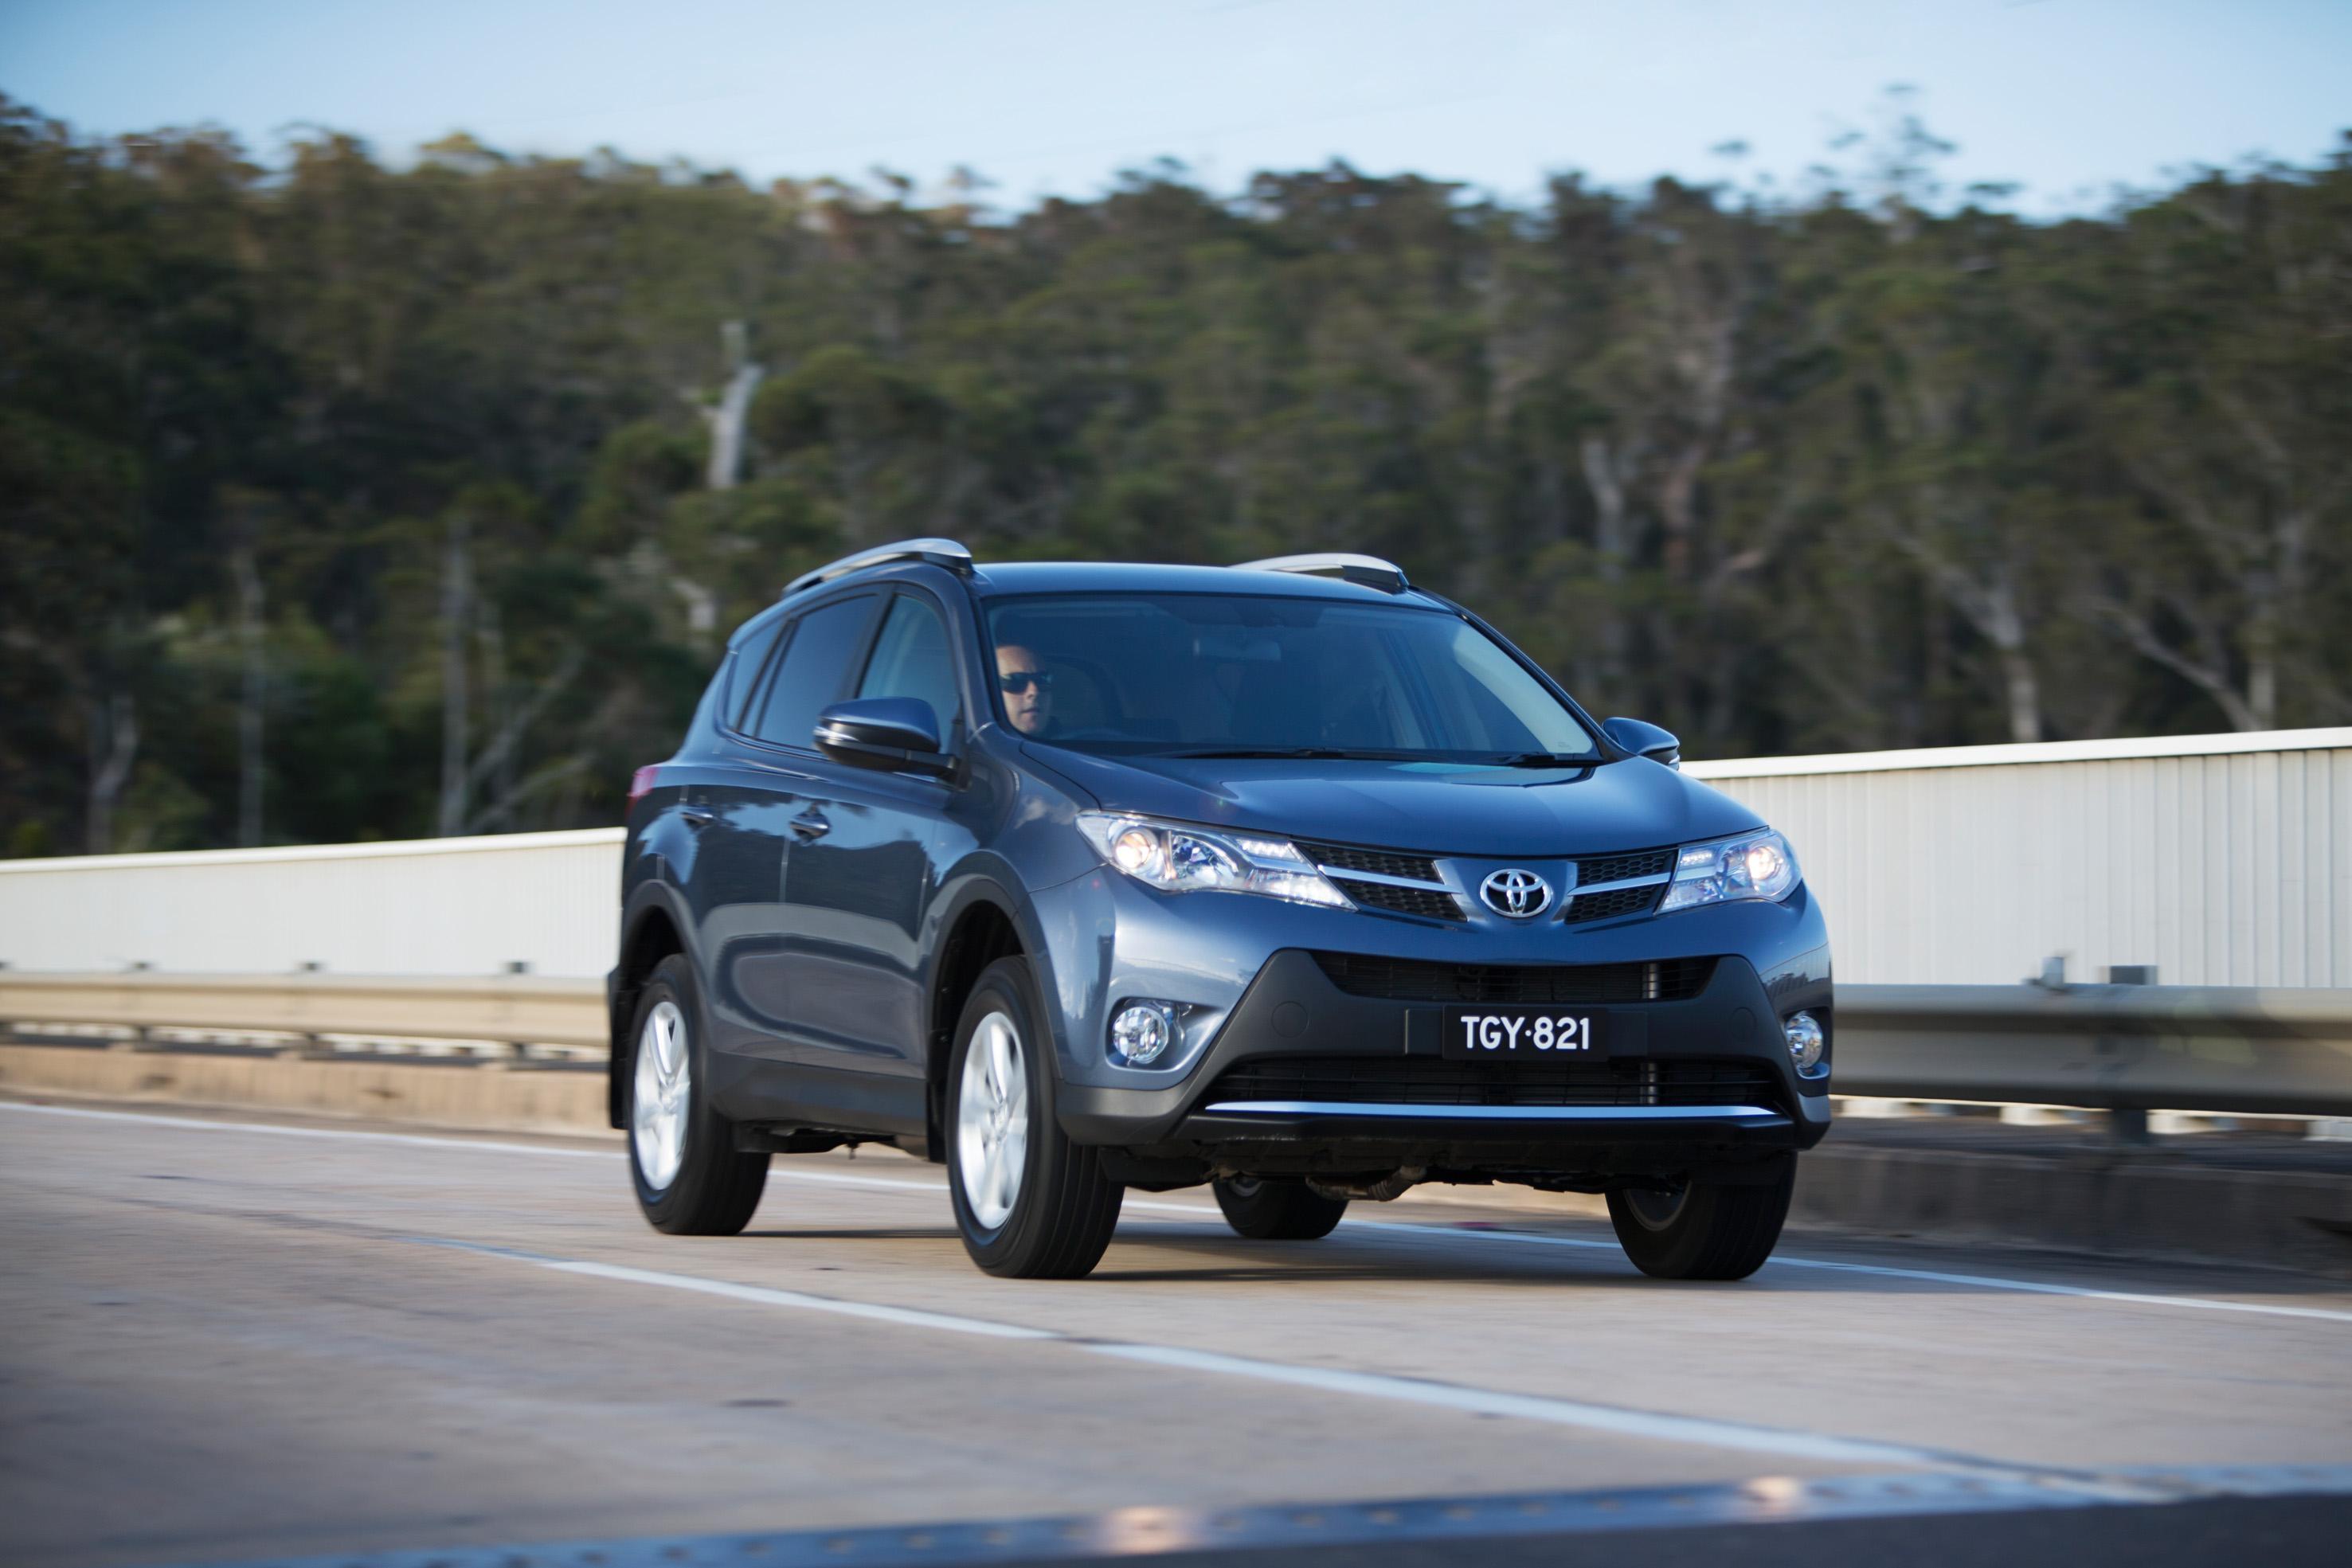 Toyota Rav4 Review Gxl 4wd Caradvice